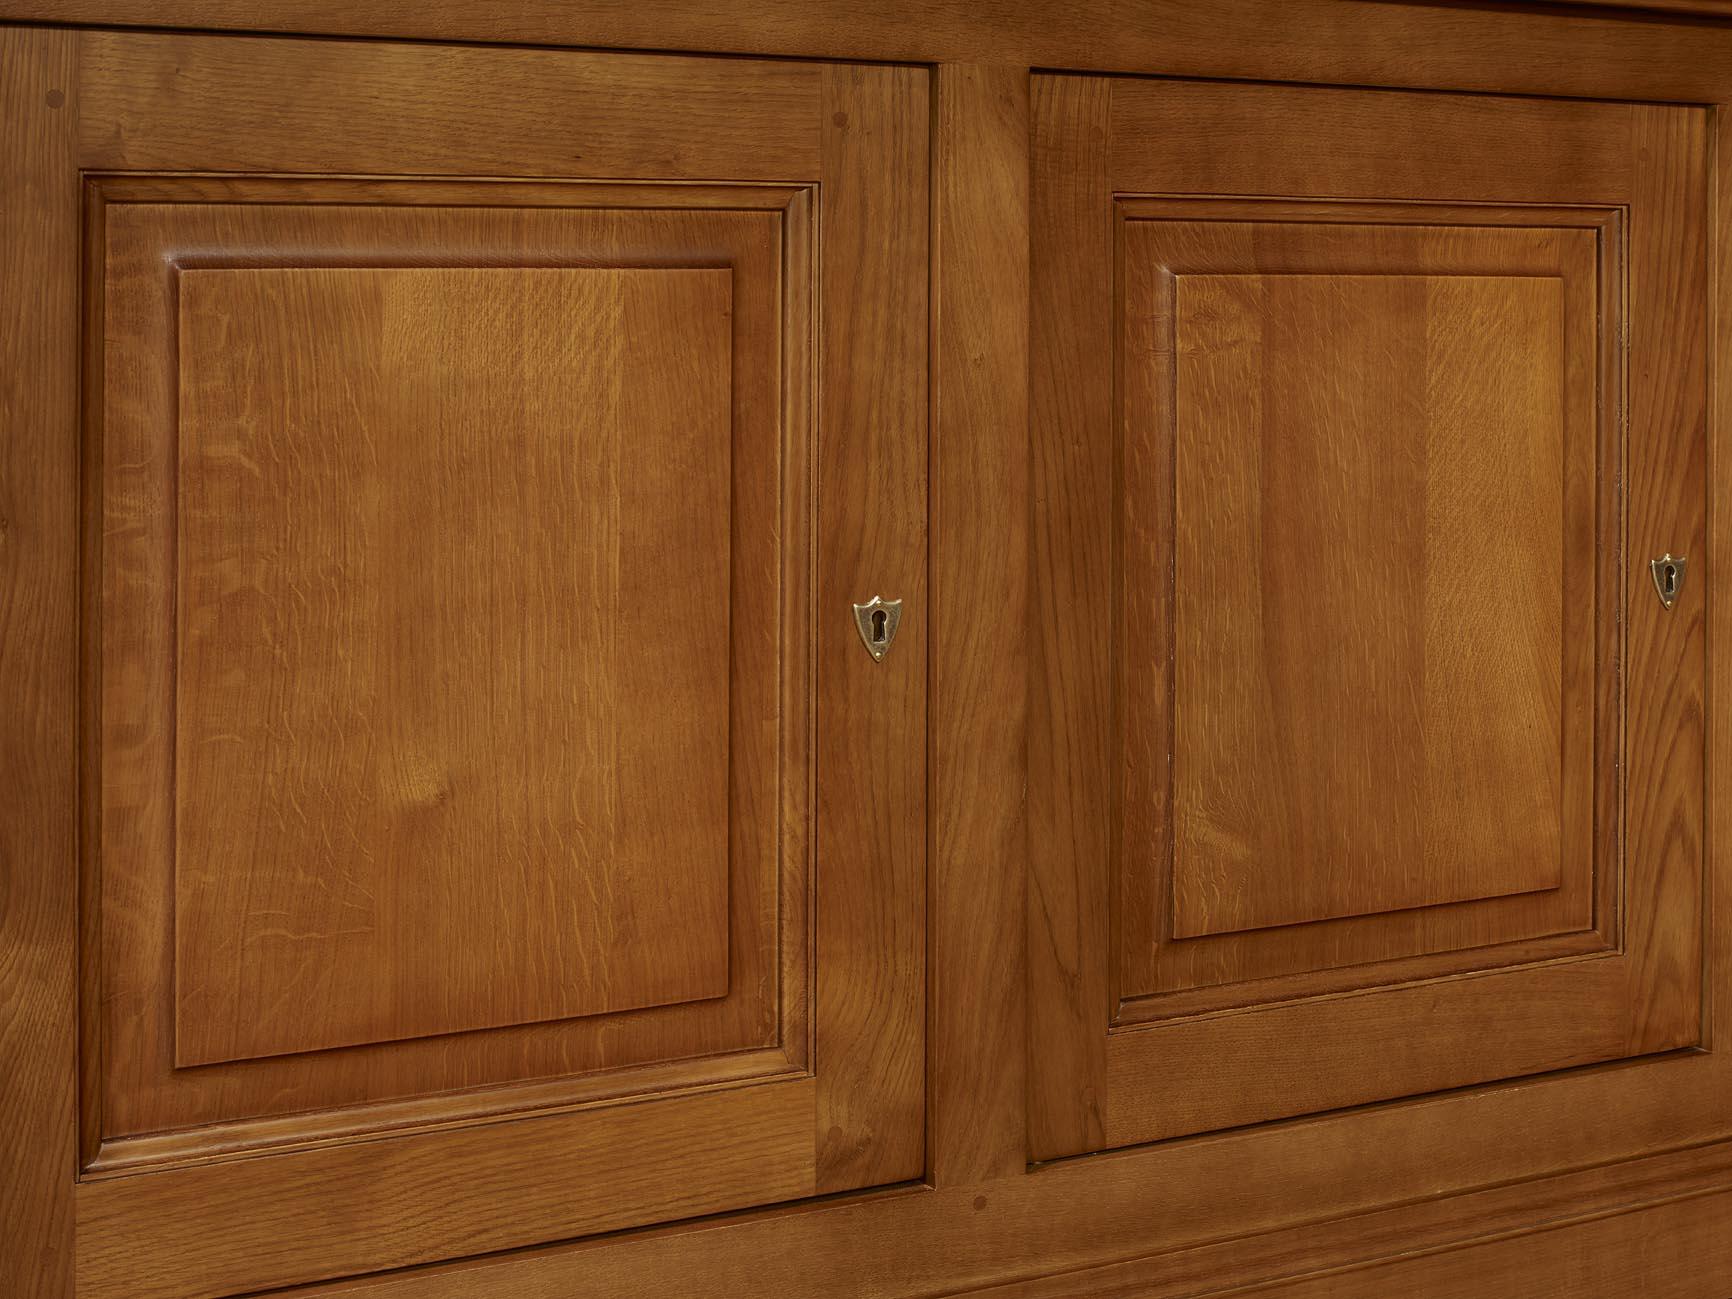 buffet 4 portes jean baptiste en ch ne massif de style louis philippe finition ch ne moyen. Black Bedroom Furniture Sets. Home Design Ideas